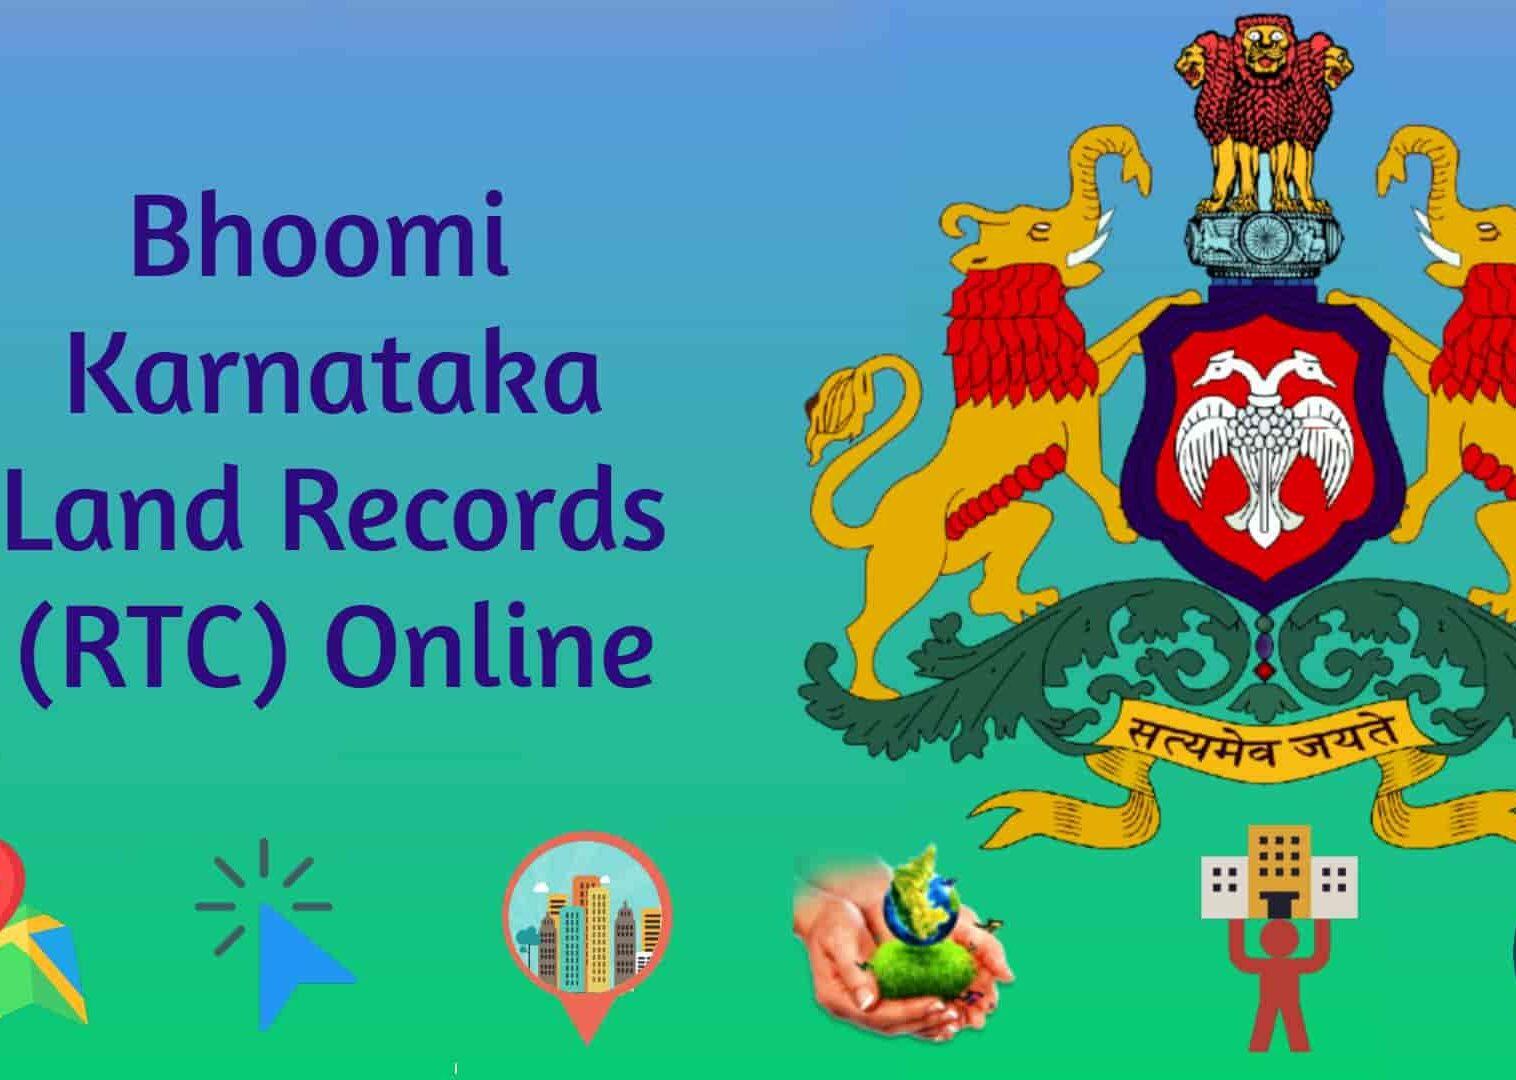 BHOOMI RTC KARNATAKA 2020